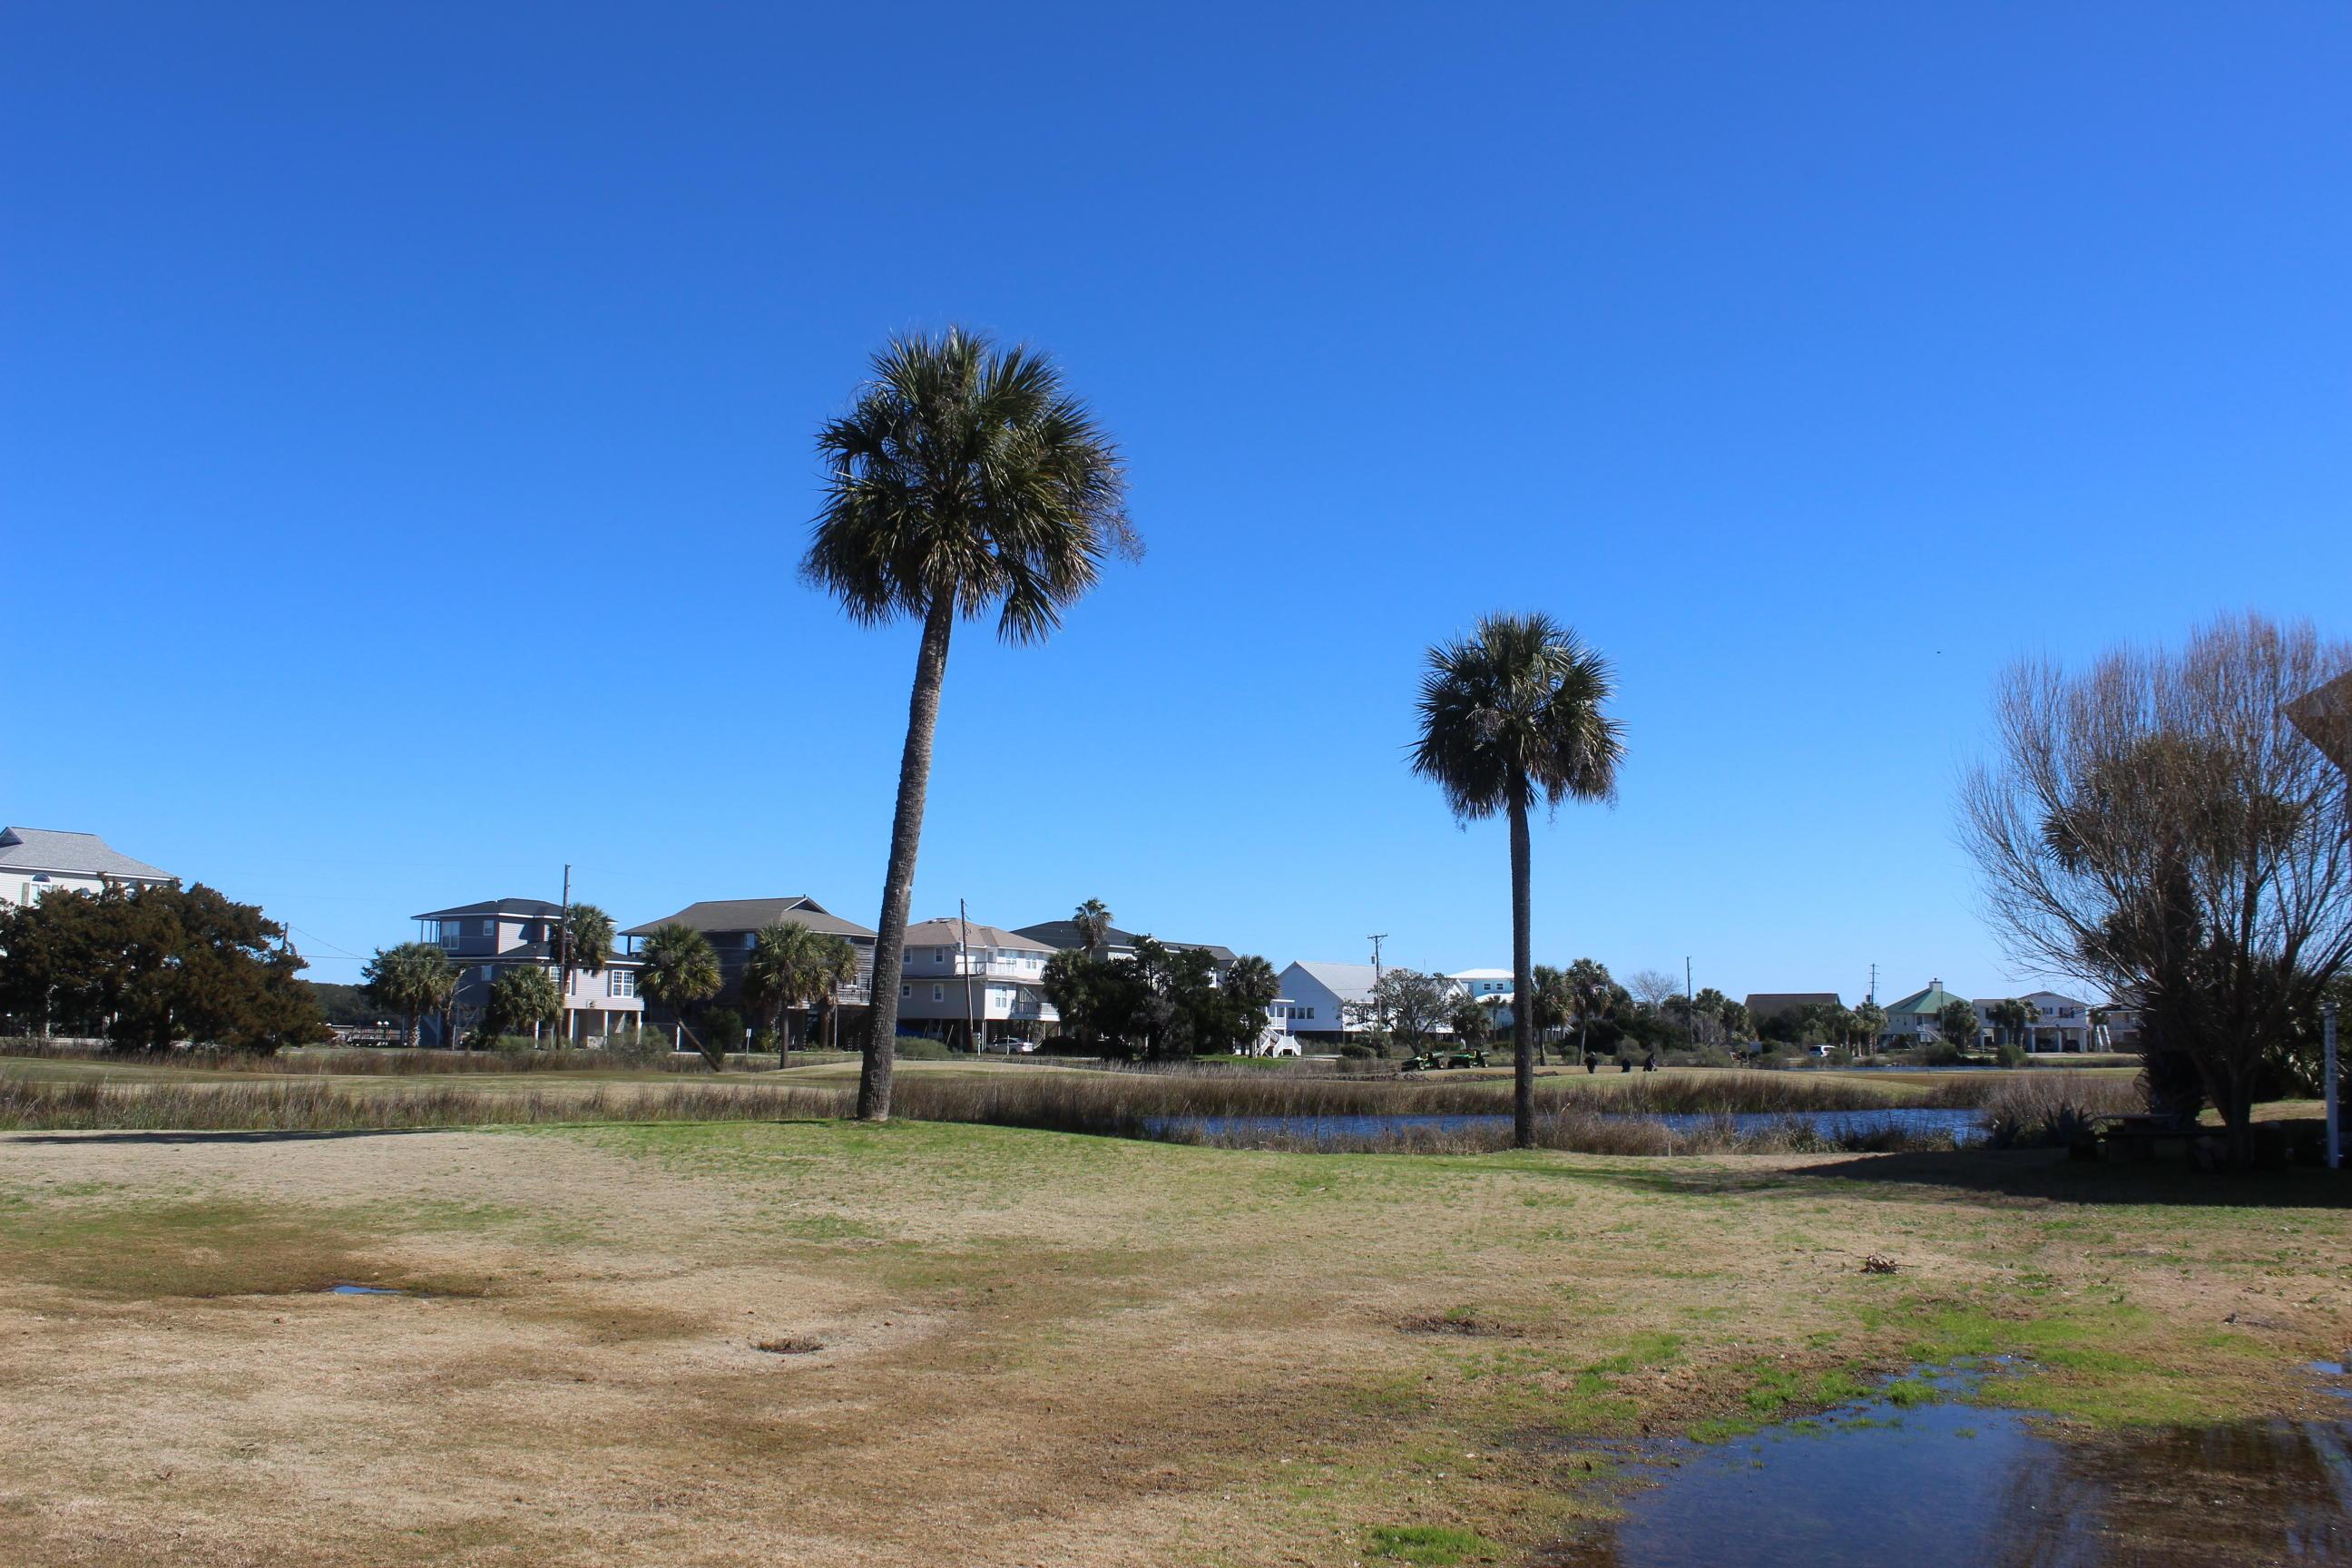 7 Battery Park Edisto Beach, SC 29438